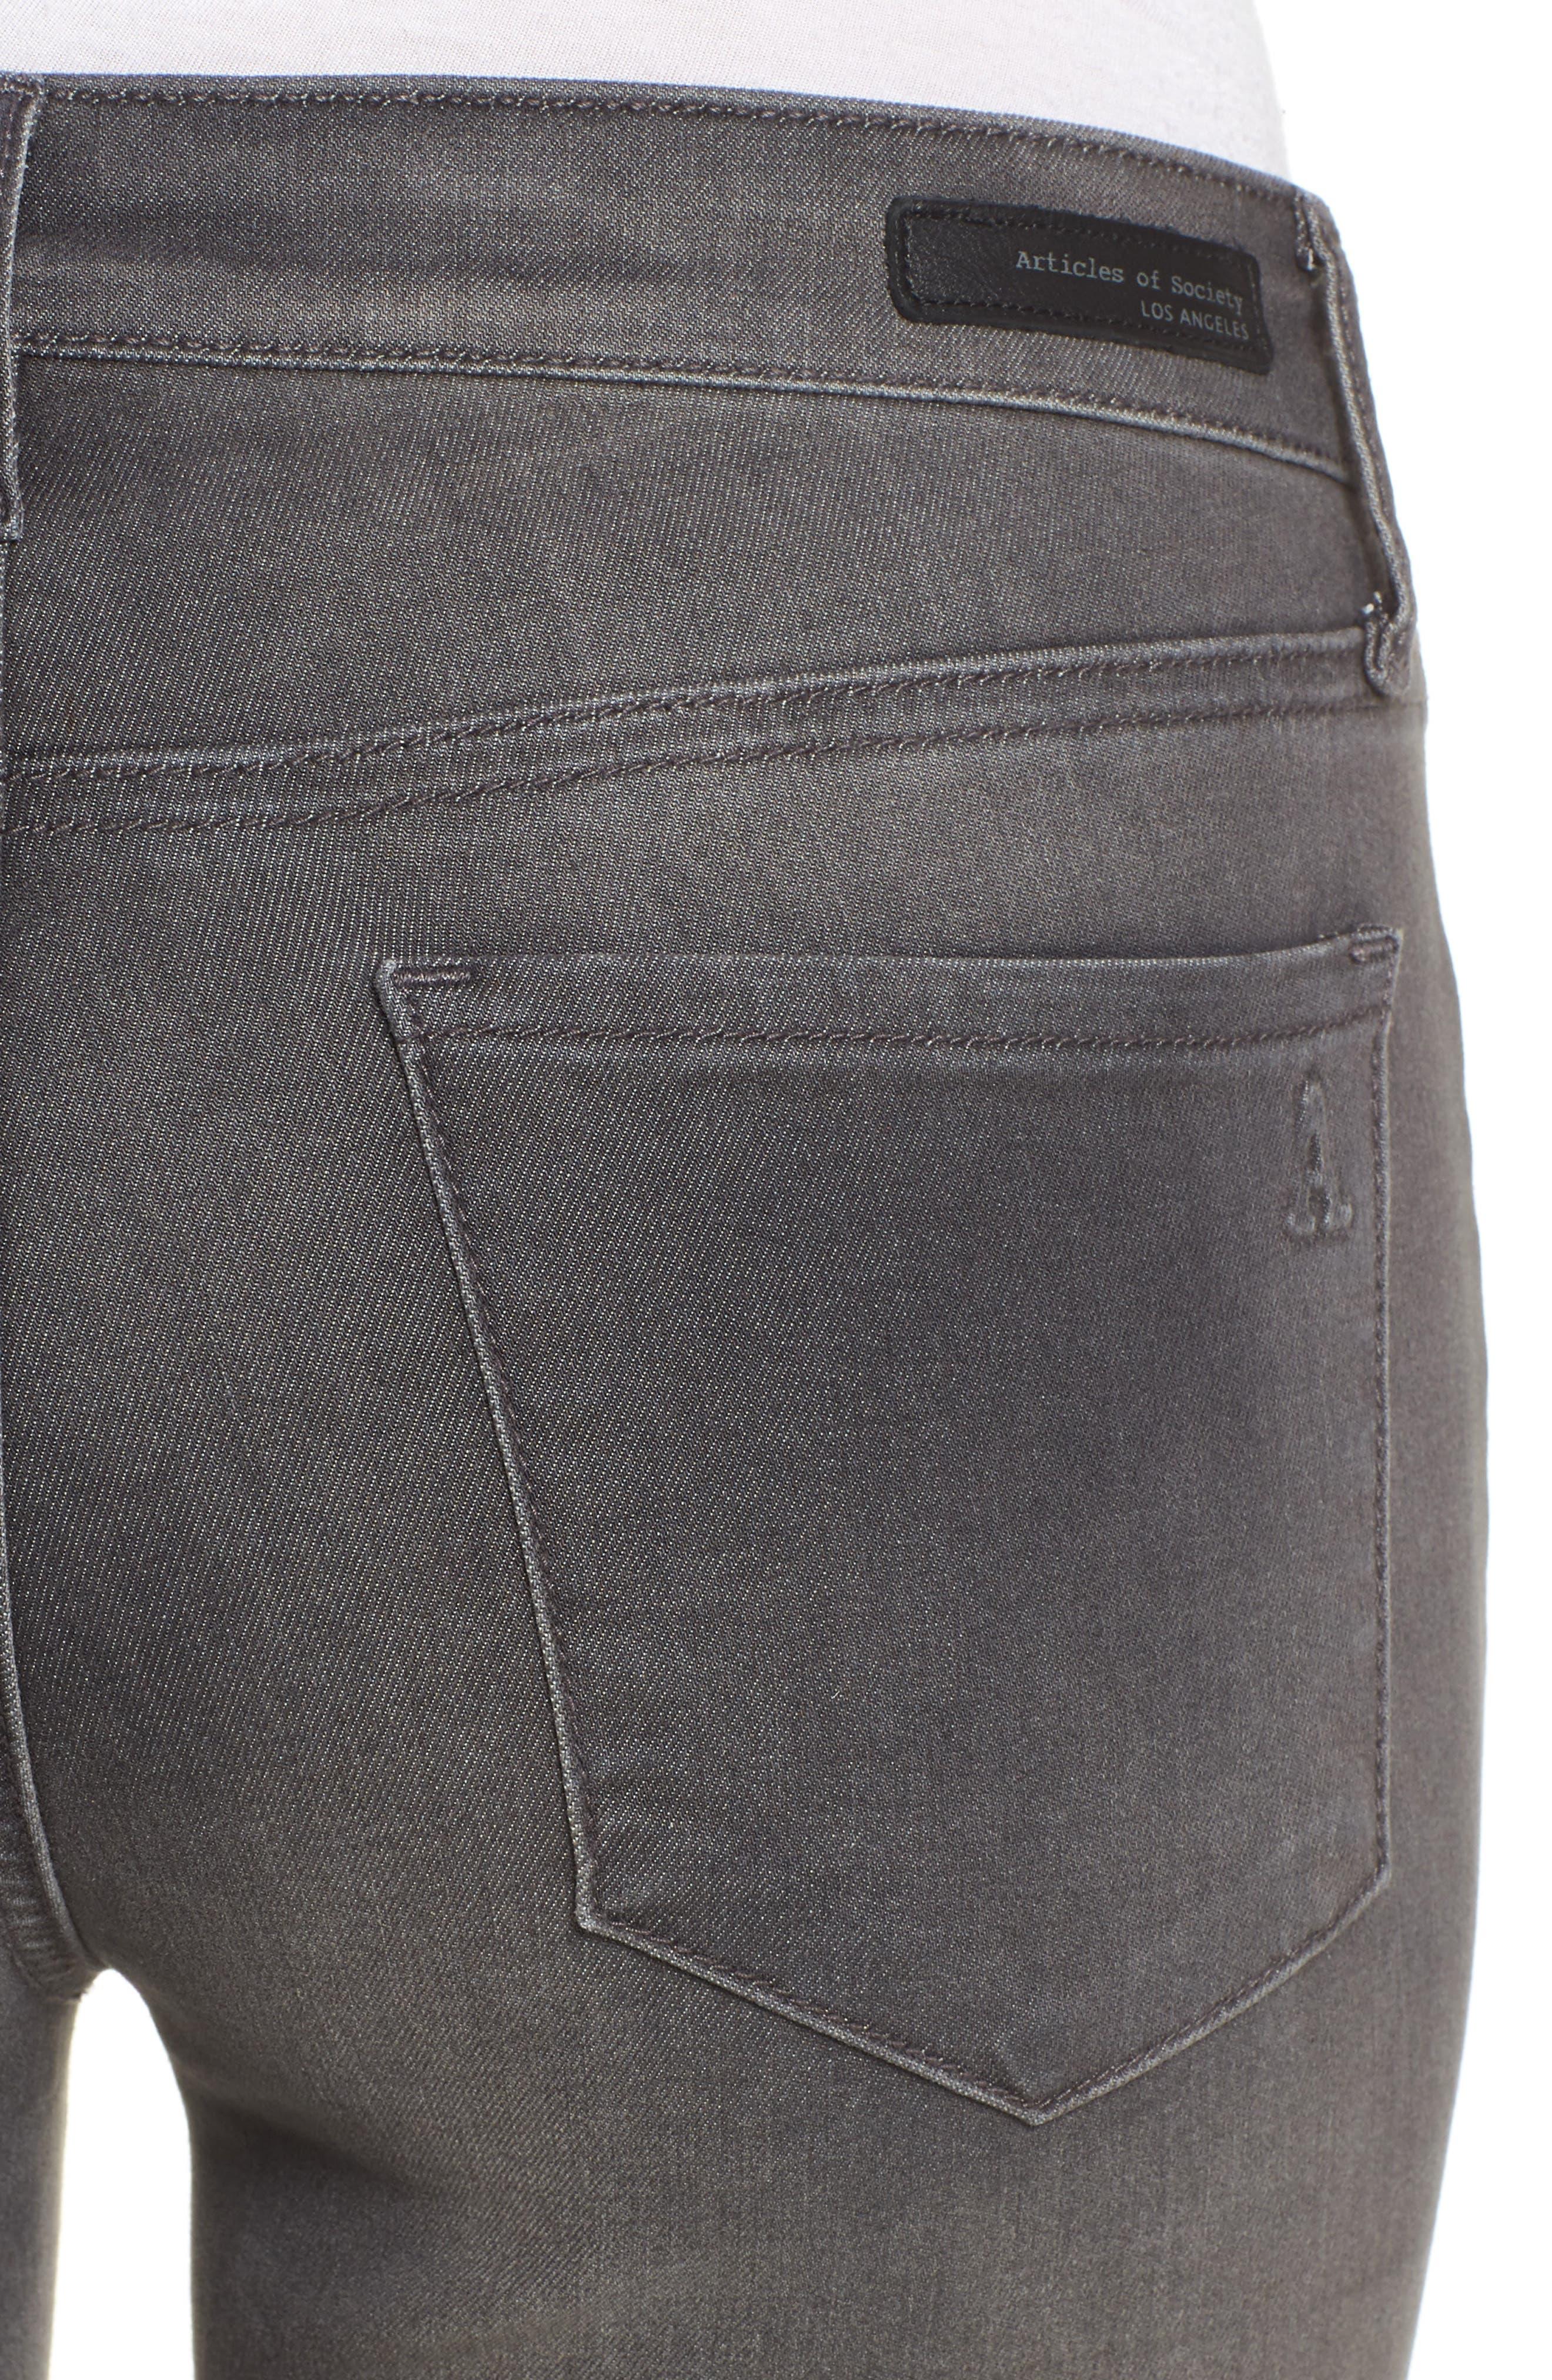 Alternate Image 4  - Articles of Society Sarah Skinny Jeans